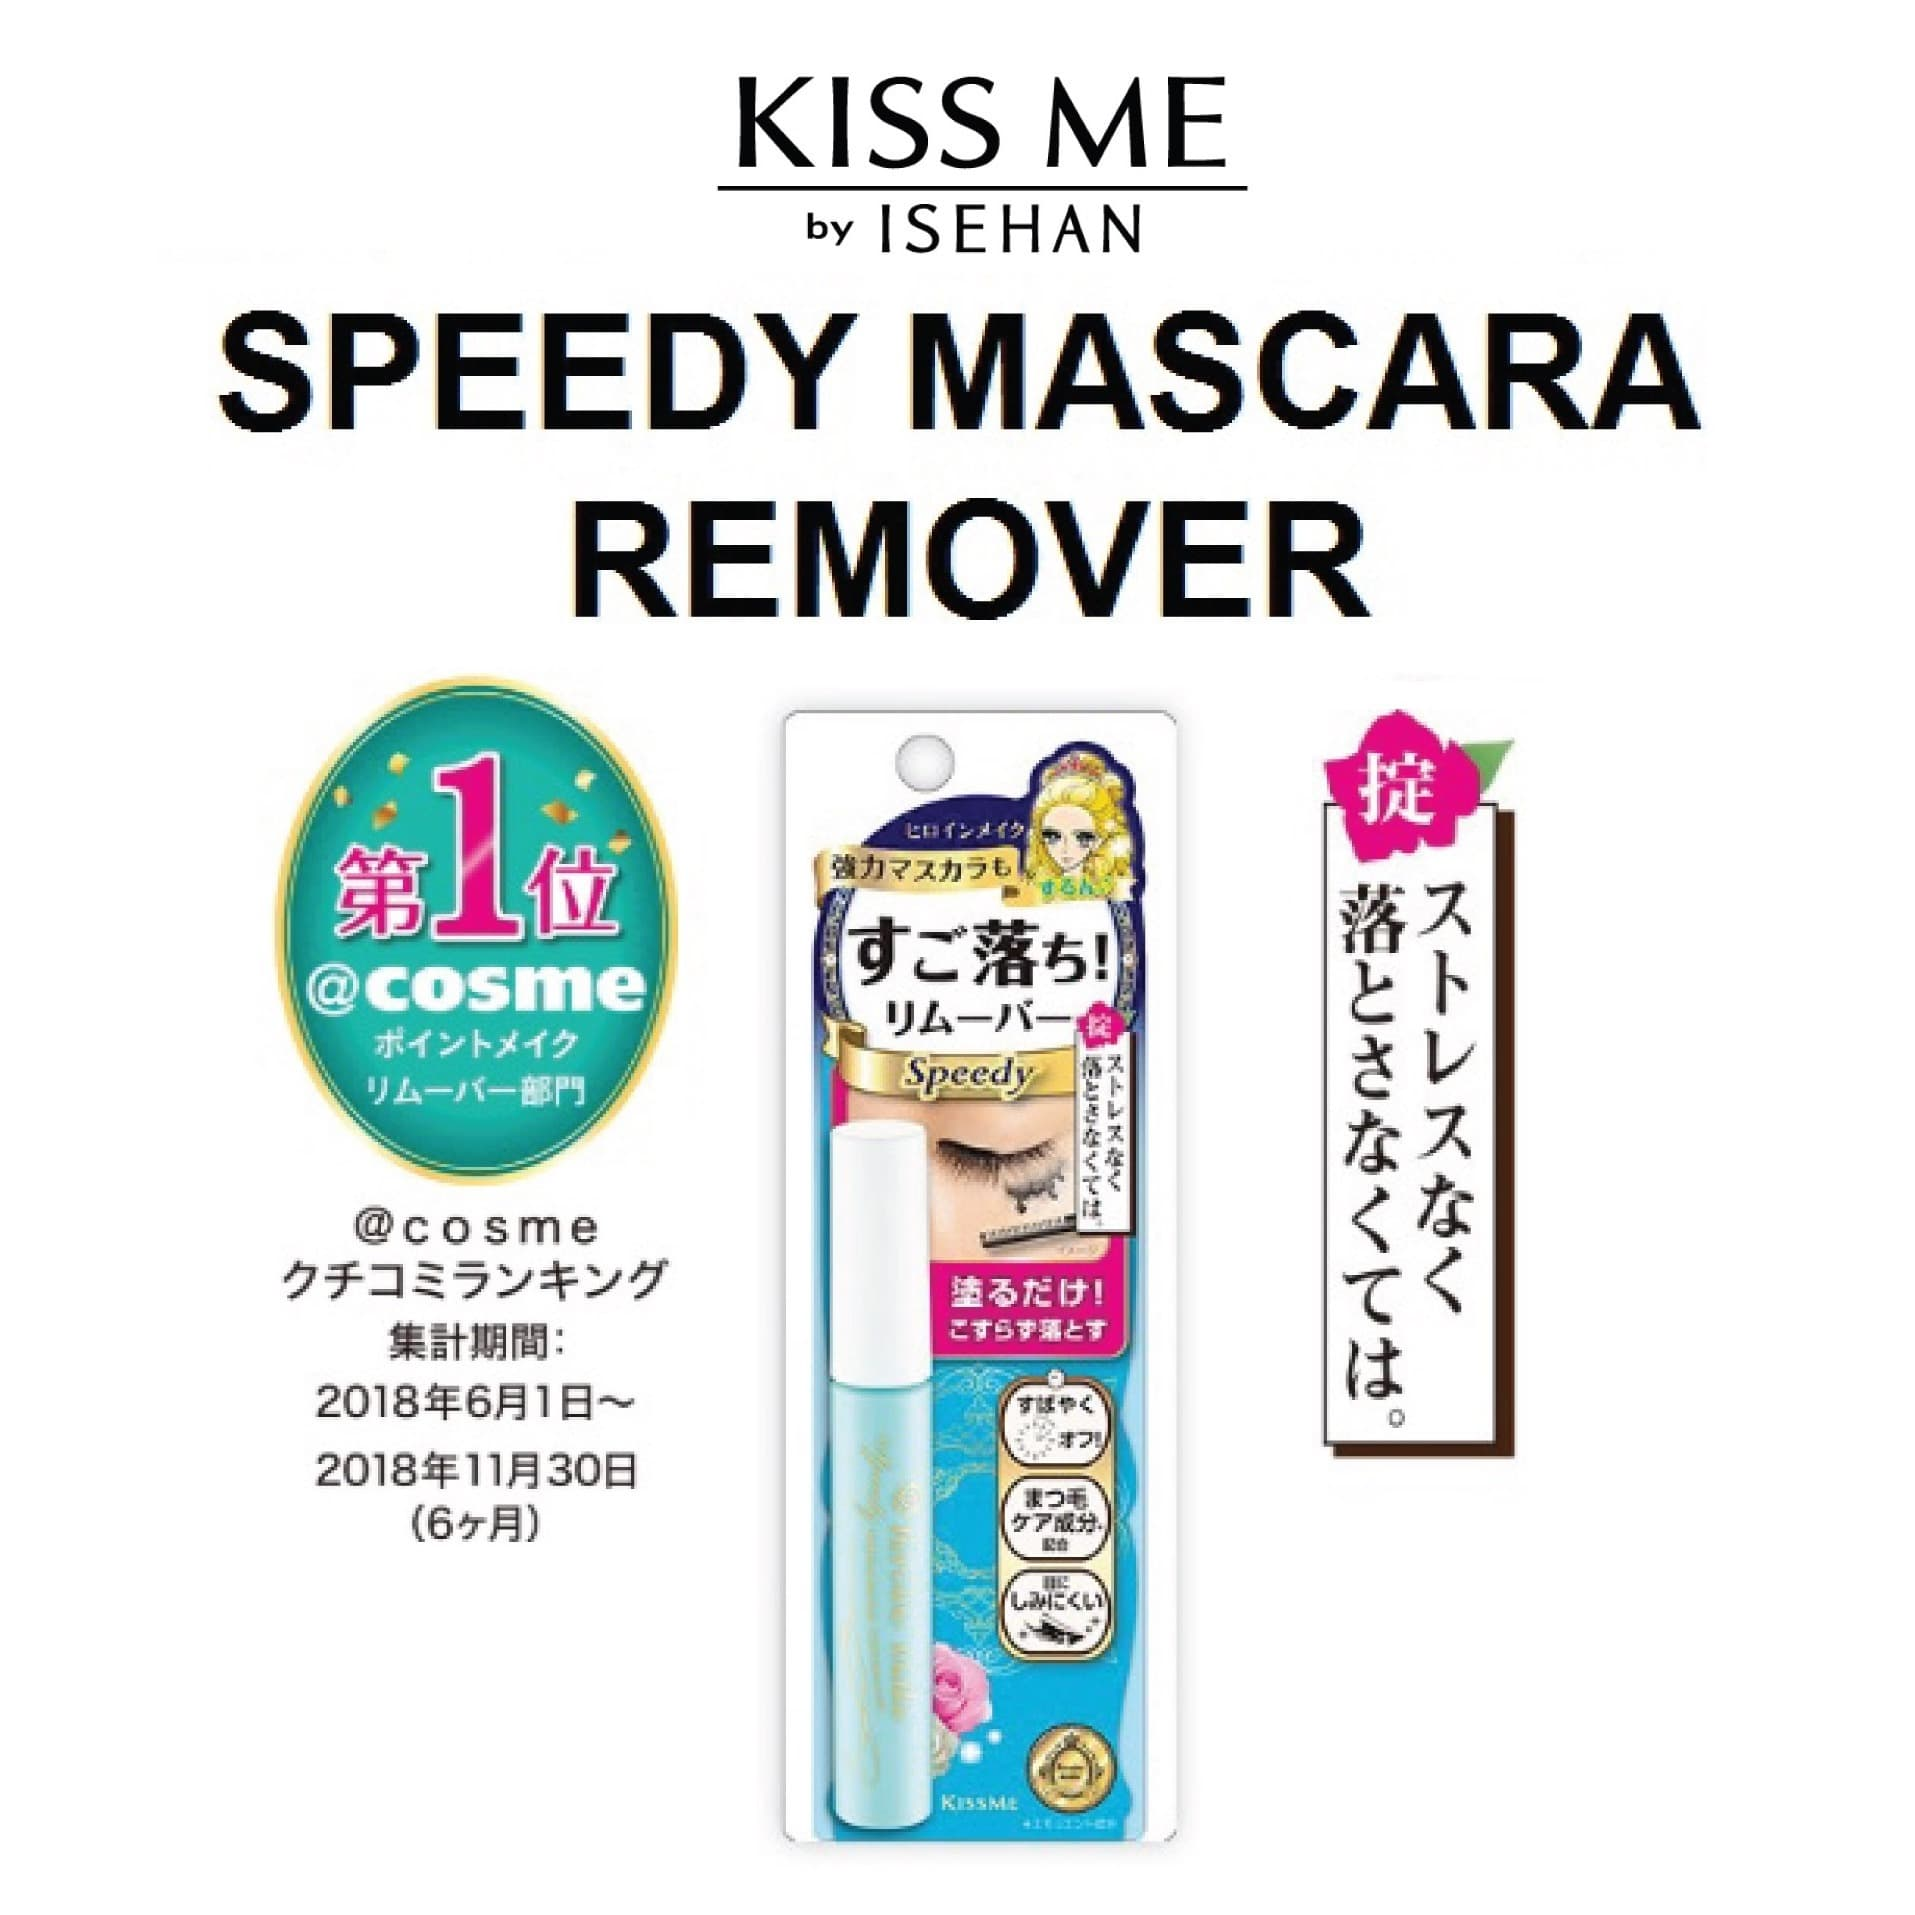 KISS ME HEROINE MAKE Speedy Mascara Remover (Pembersih Mascara) Japan thumbnail